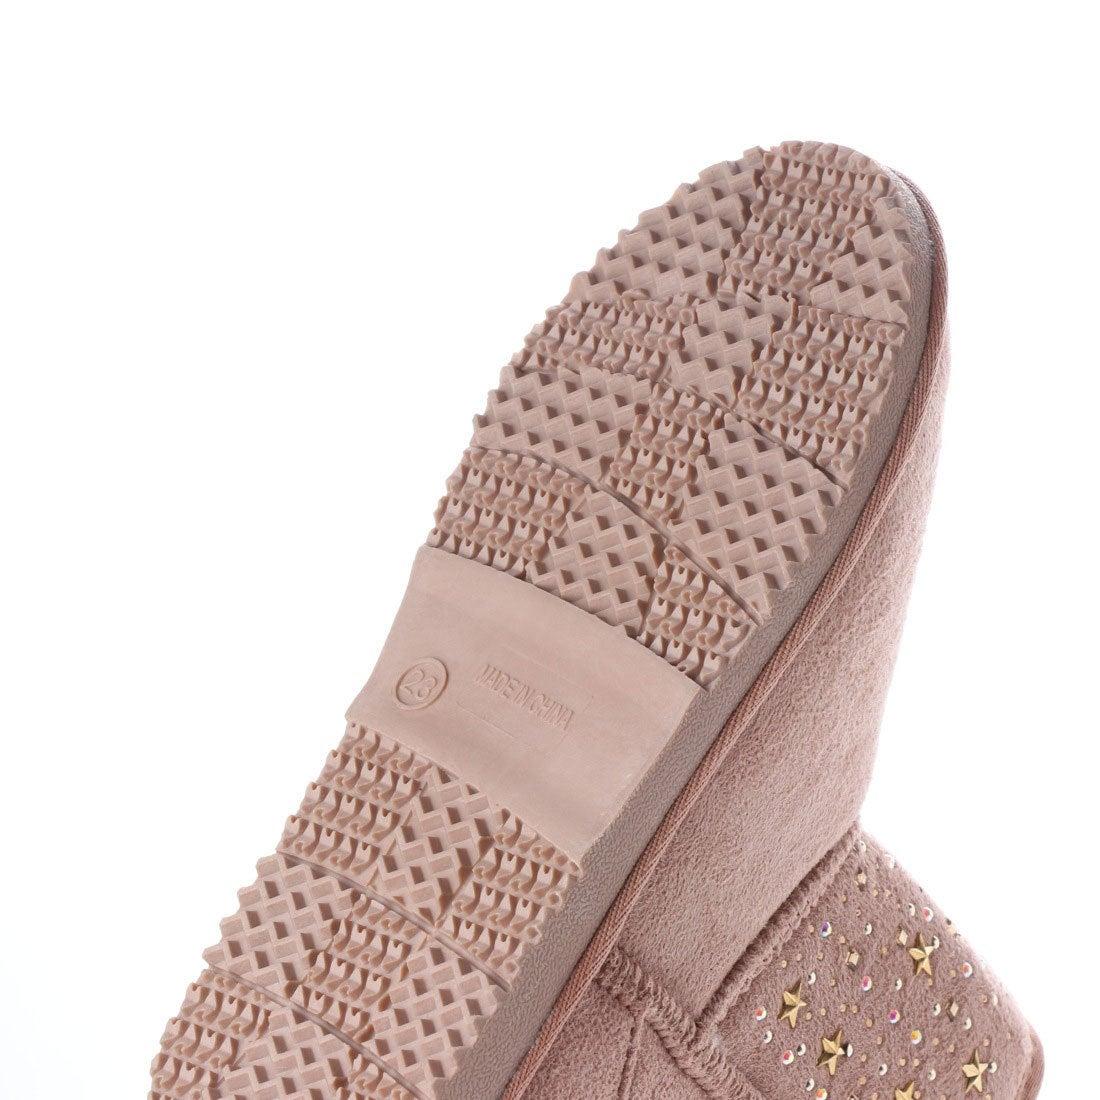 00cd86f88e702 ベティーキッズ Betty Kids BK-37001 (PK) -靴&ファッション通販 ...